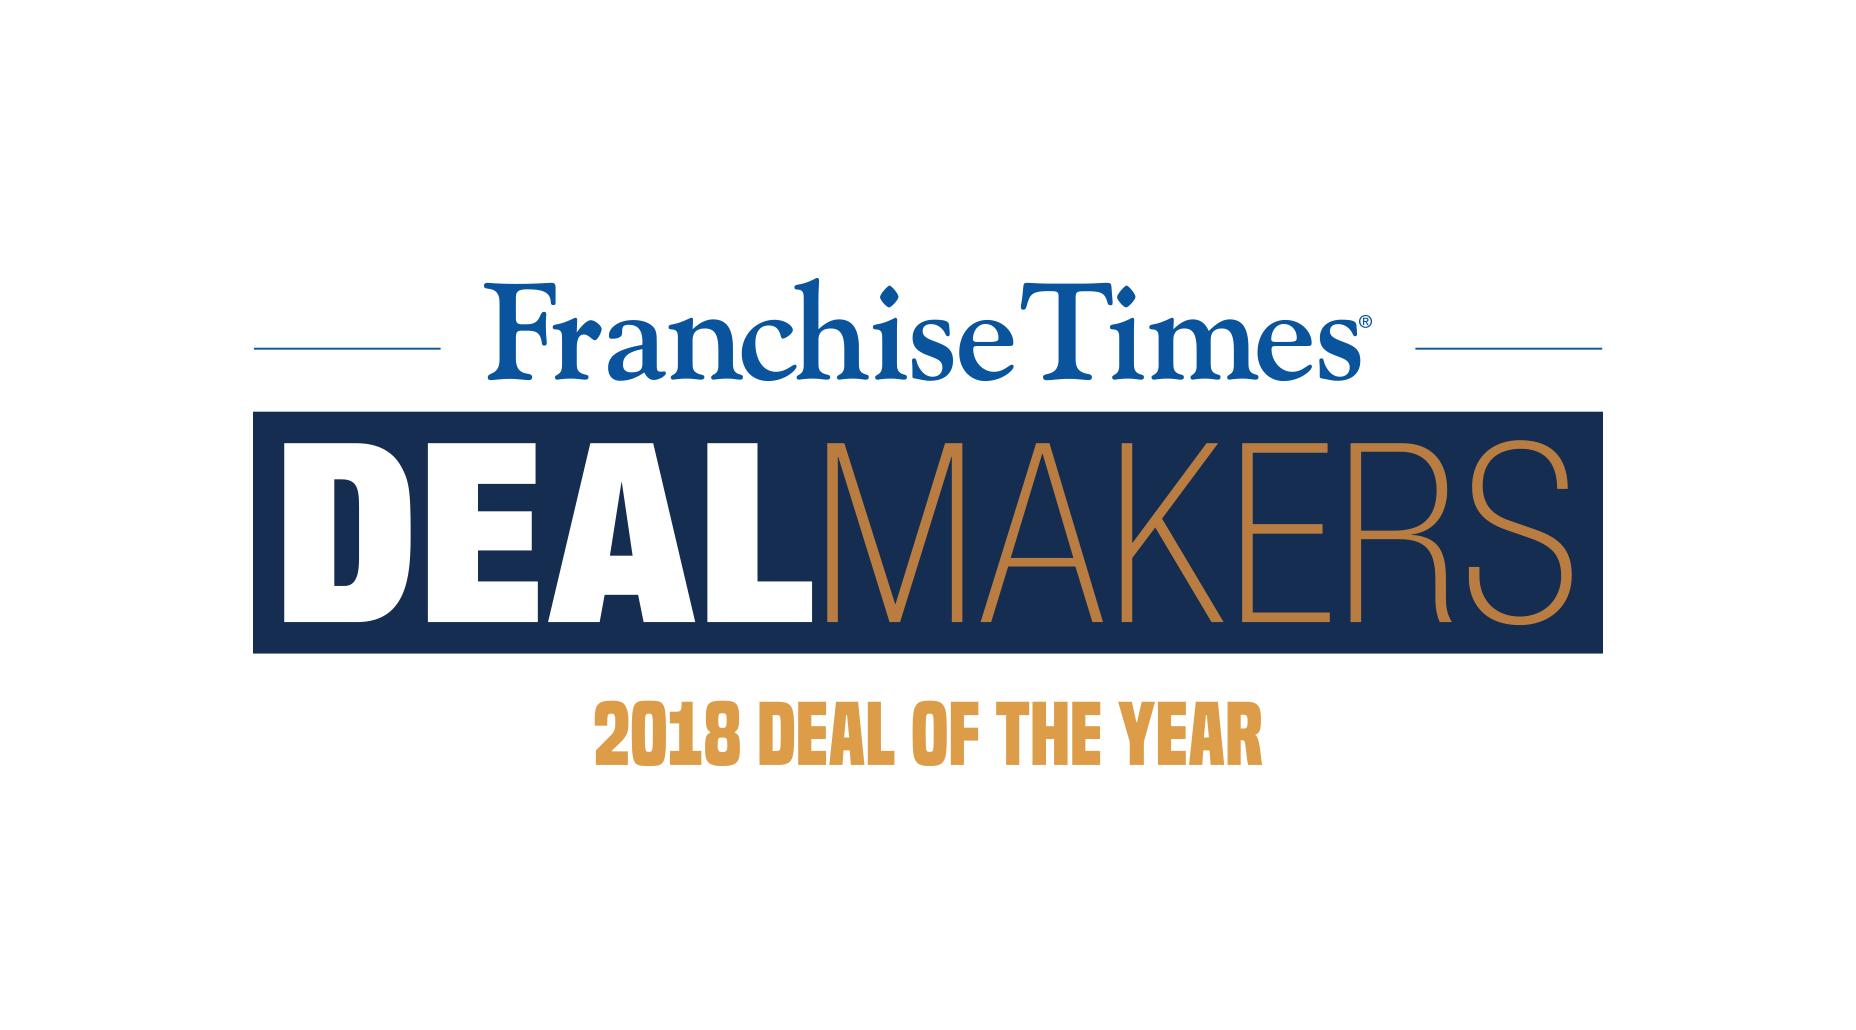 Franchise Times DealMakers logo